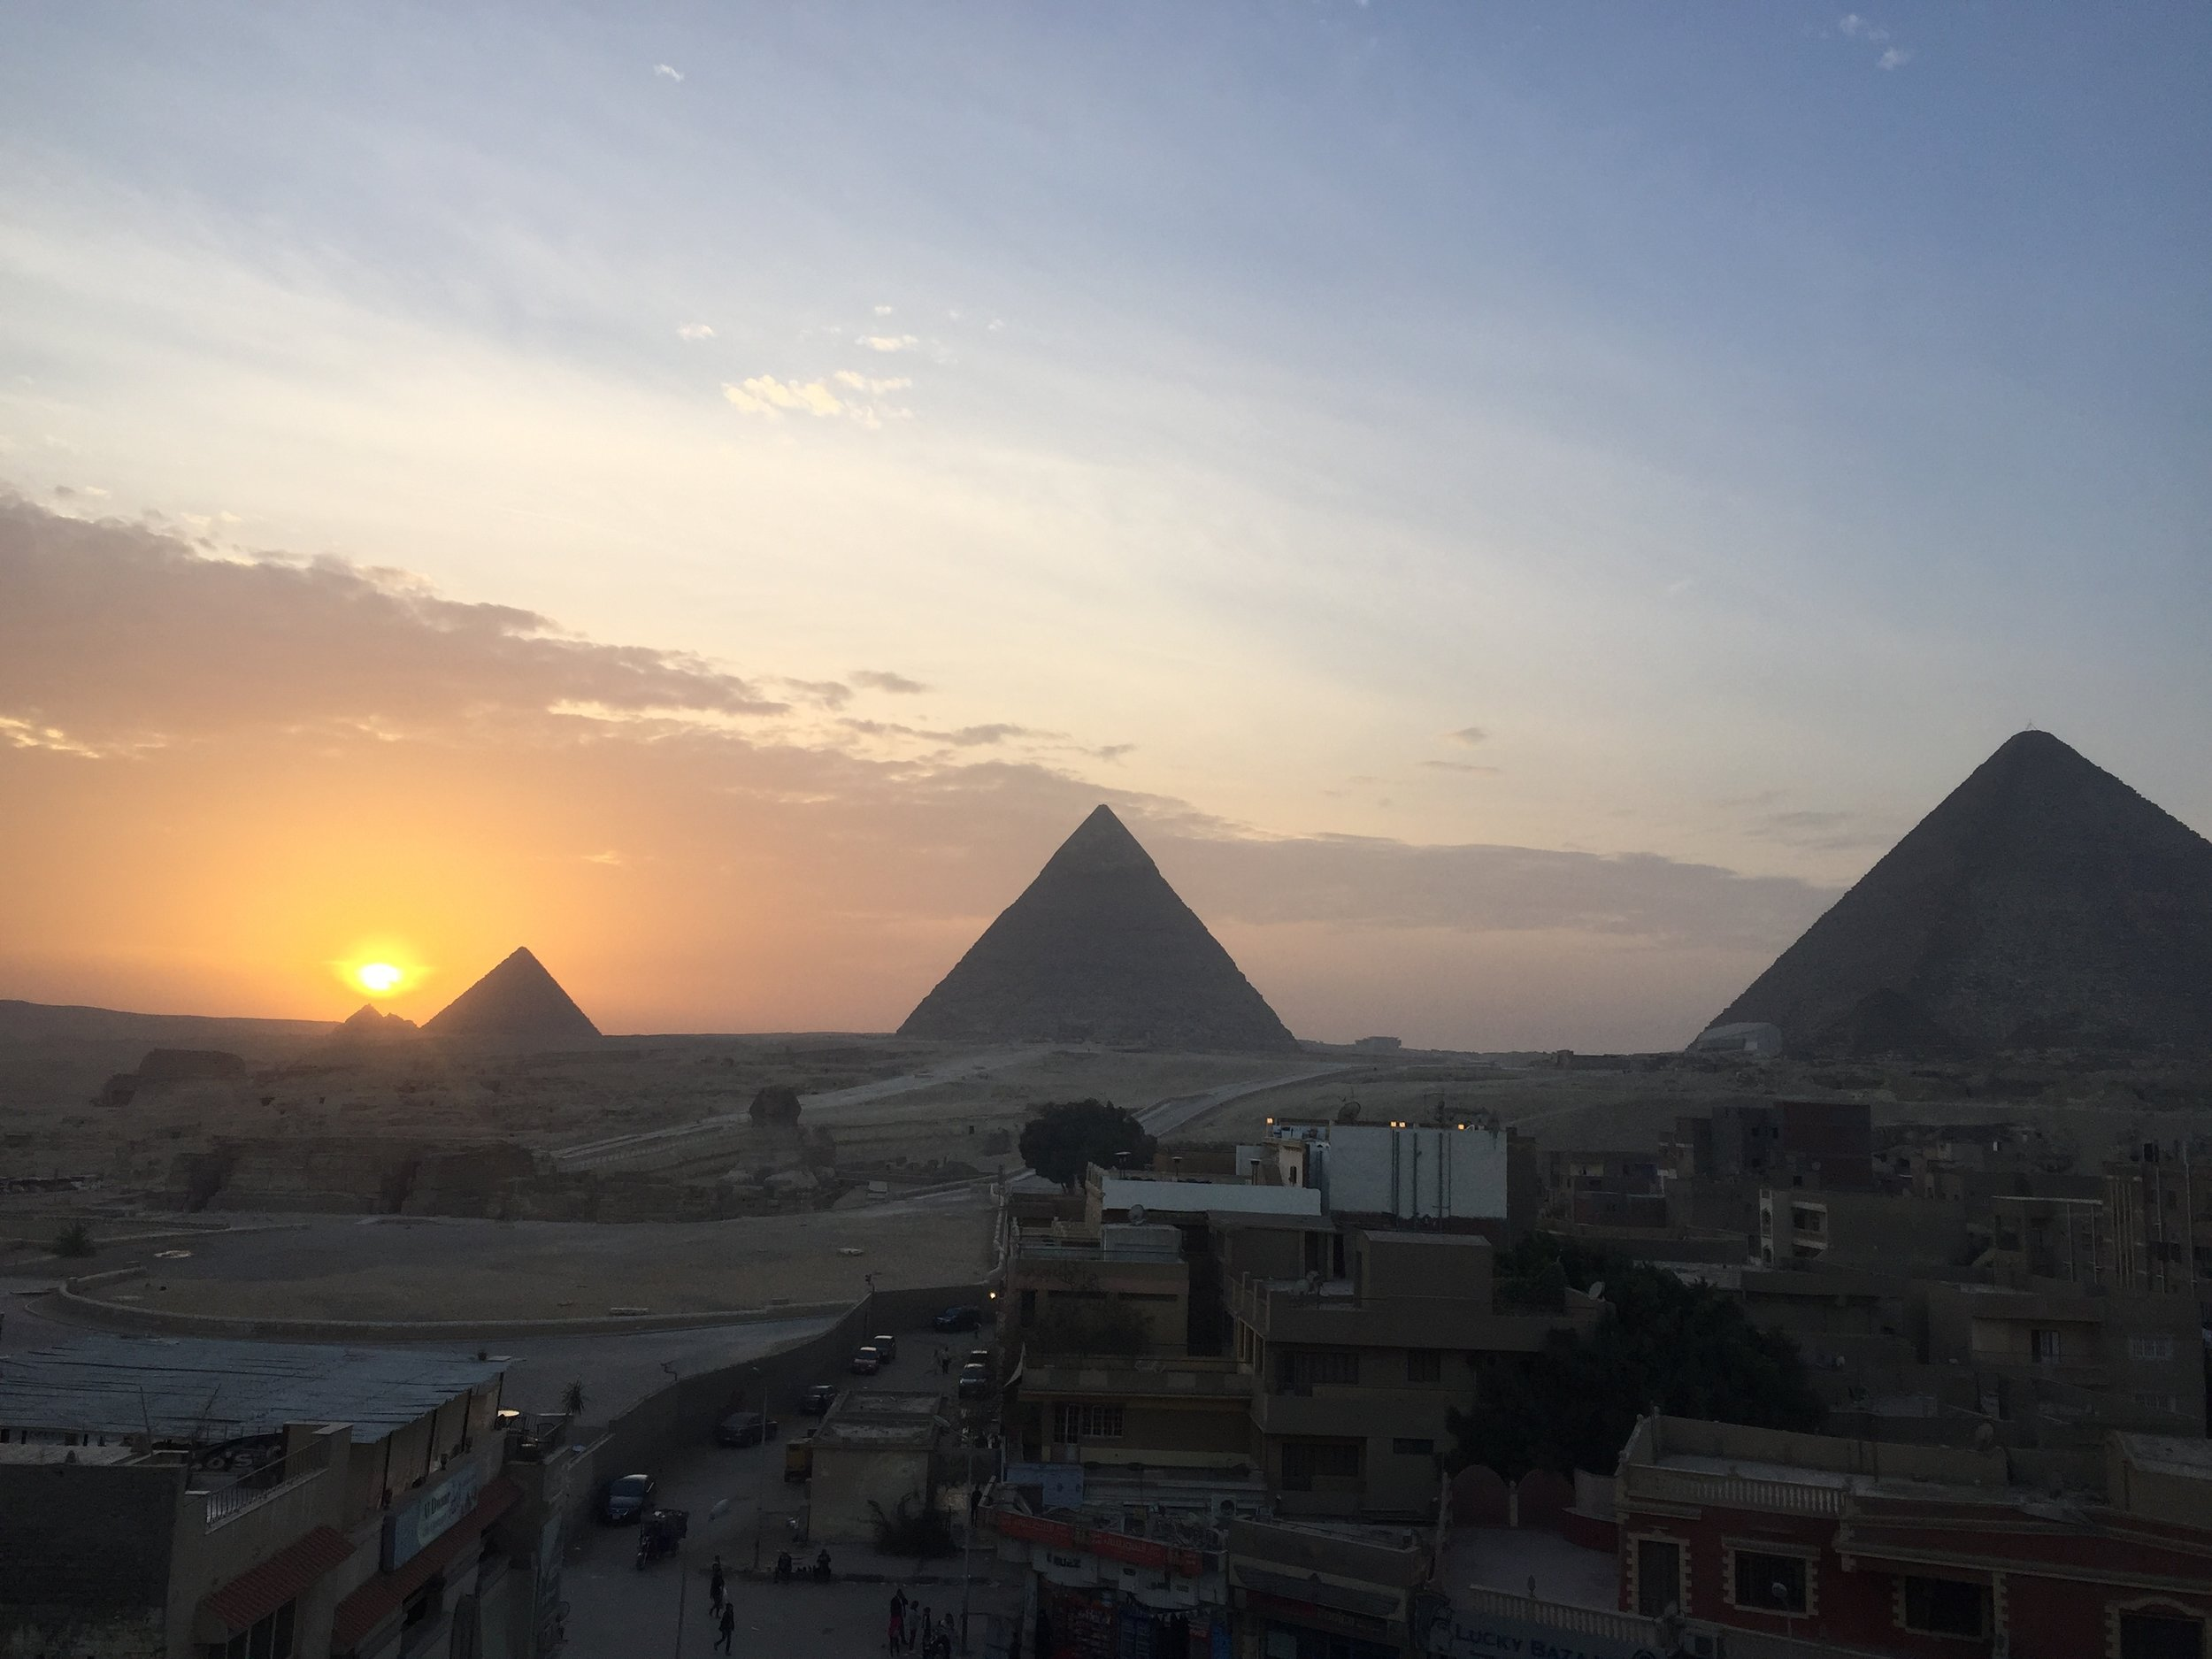 The pyramids of Giza at Sunset.